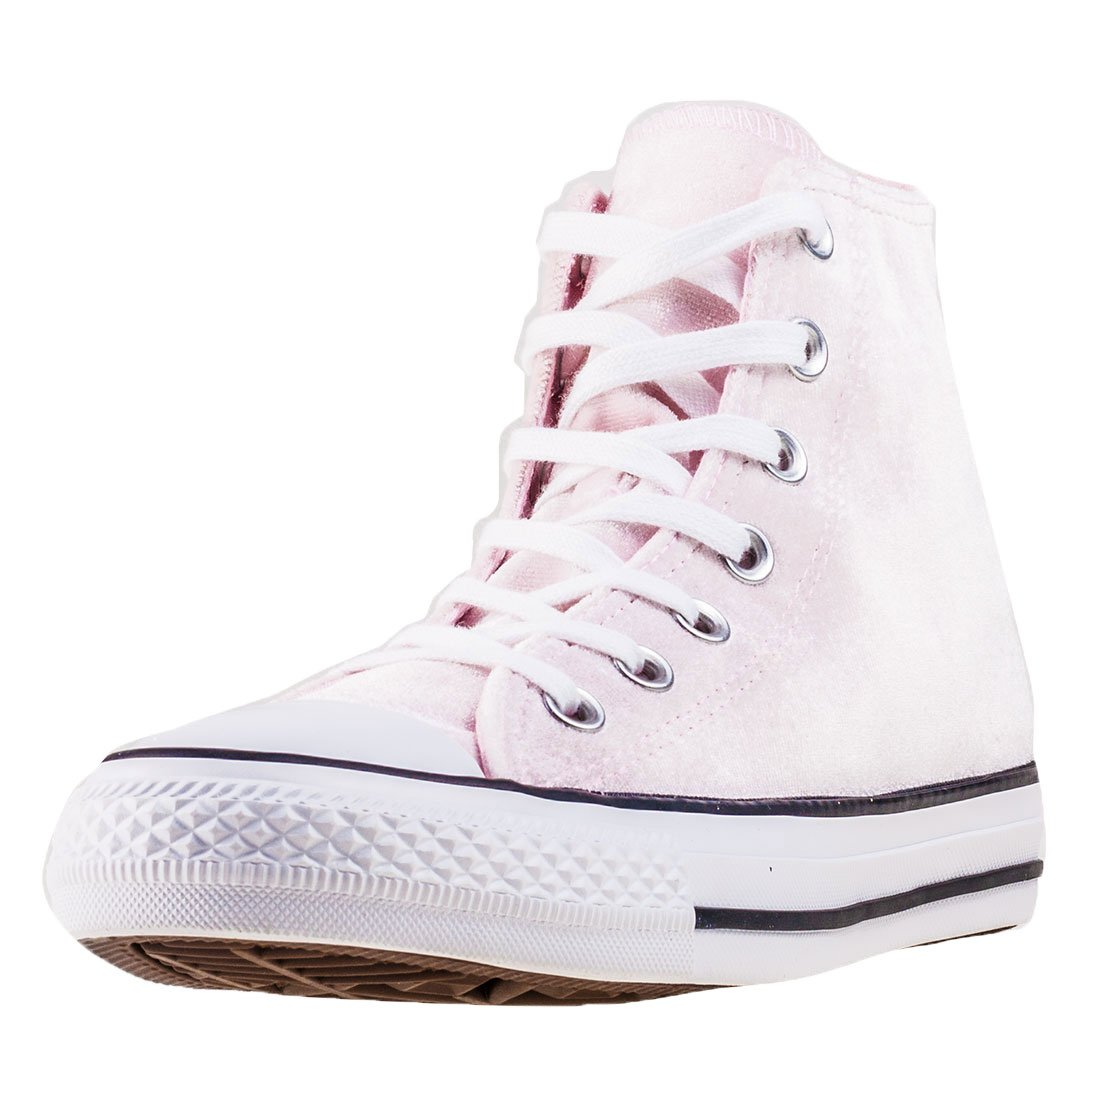 Converse Chucks 1J793 Herren Sneaker  7 B(M) US Women / 5 D(M) US Men|Pink